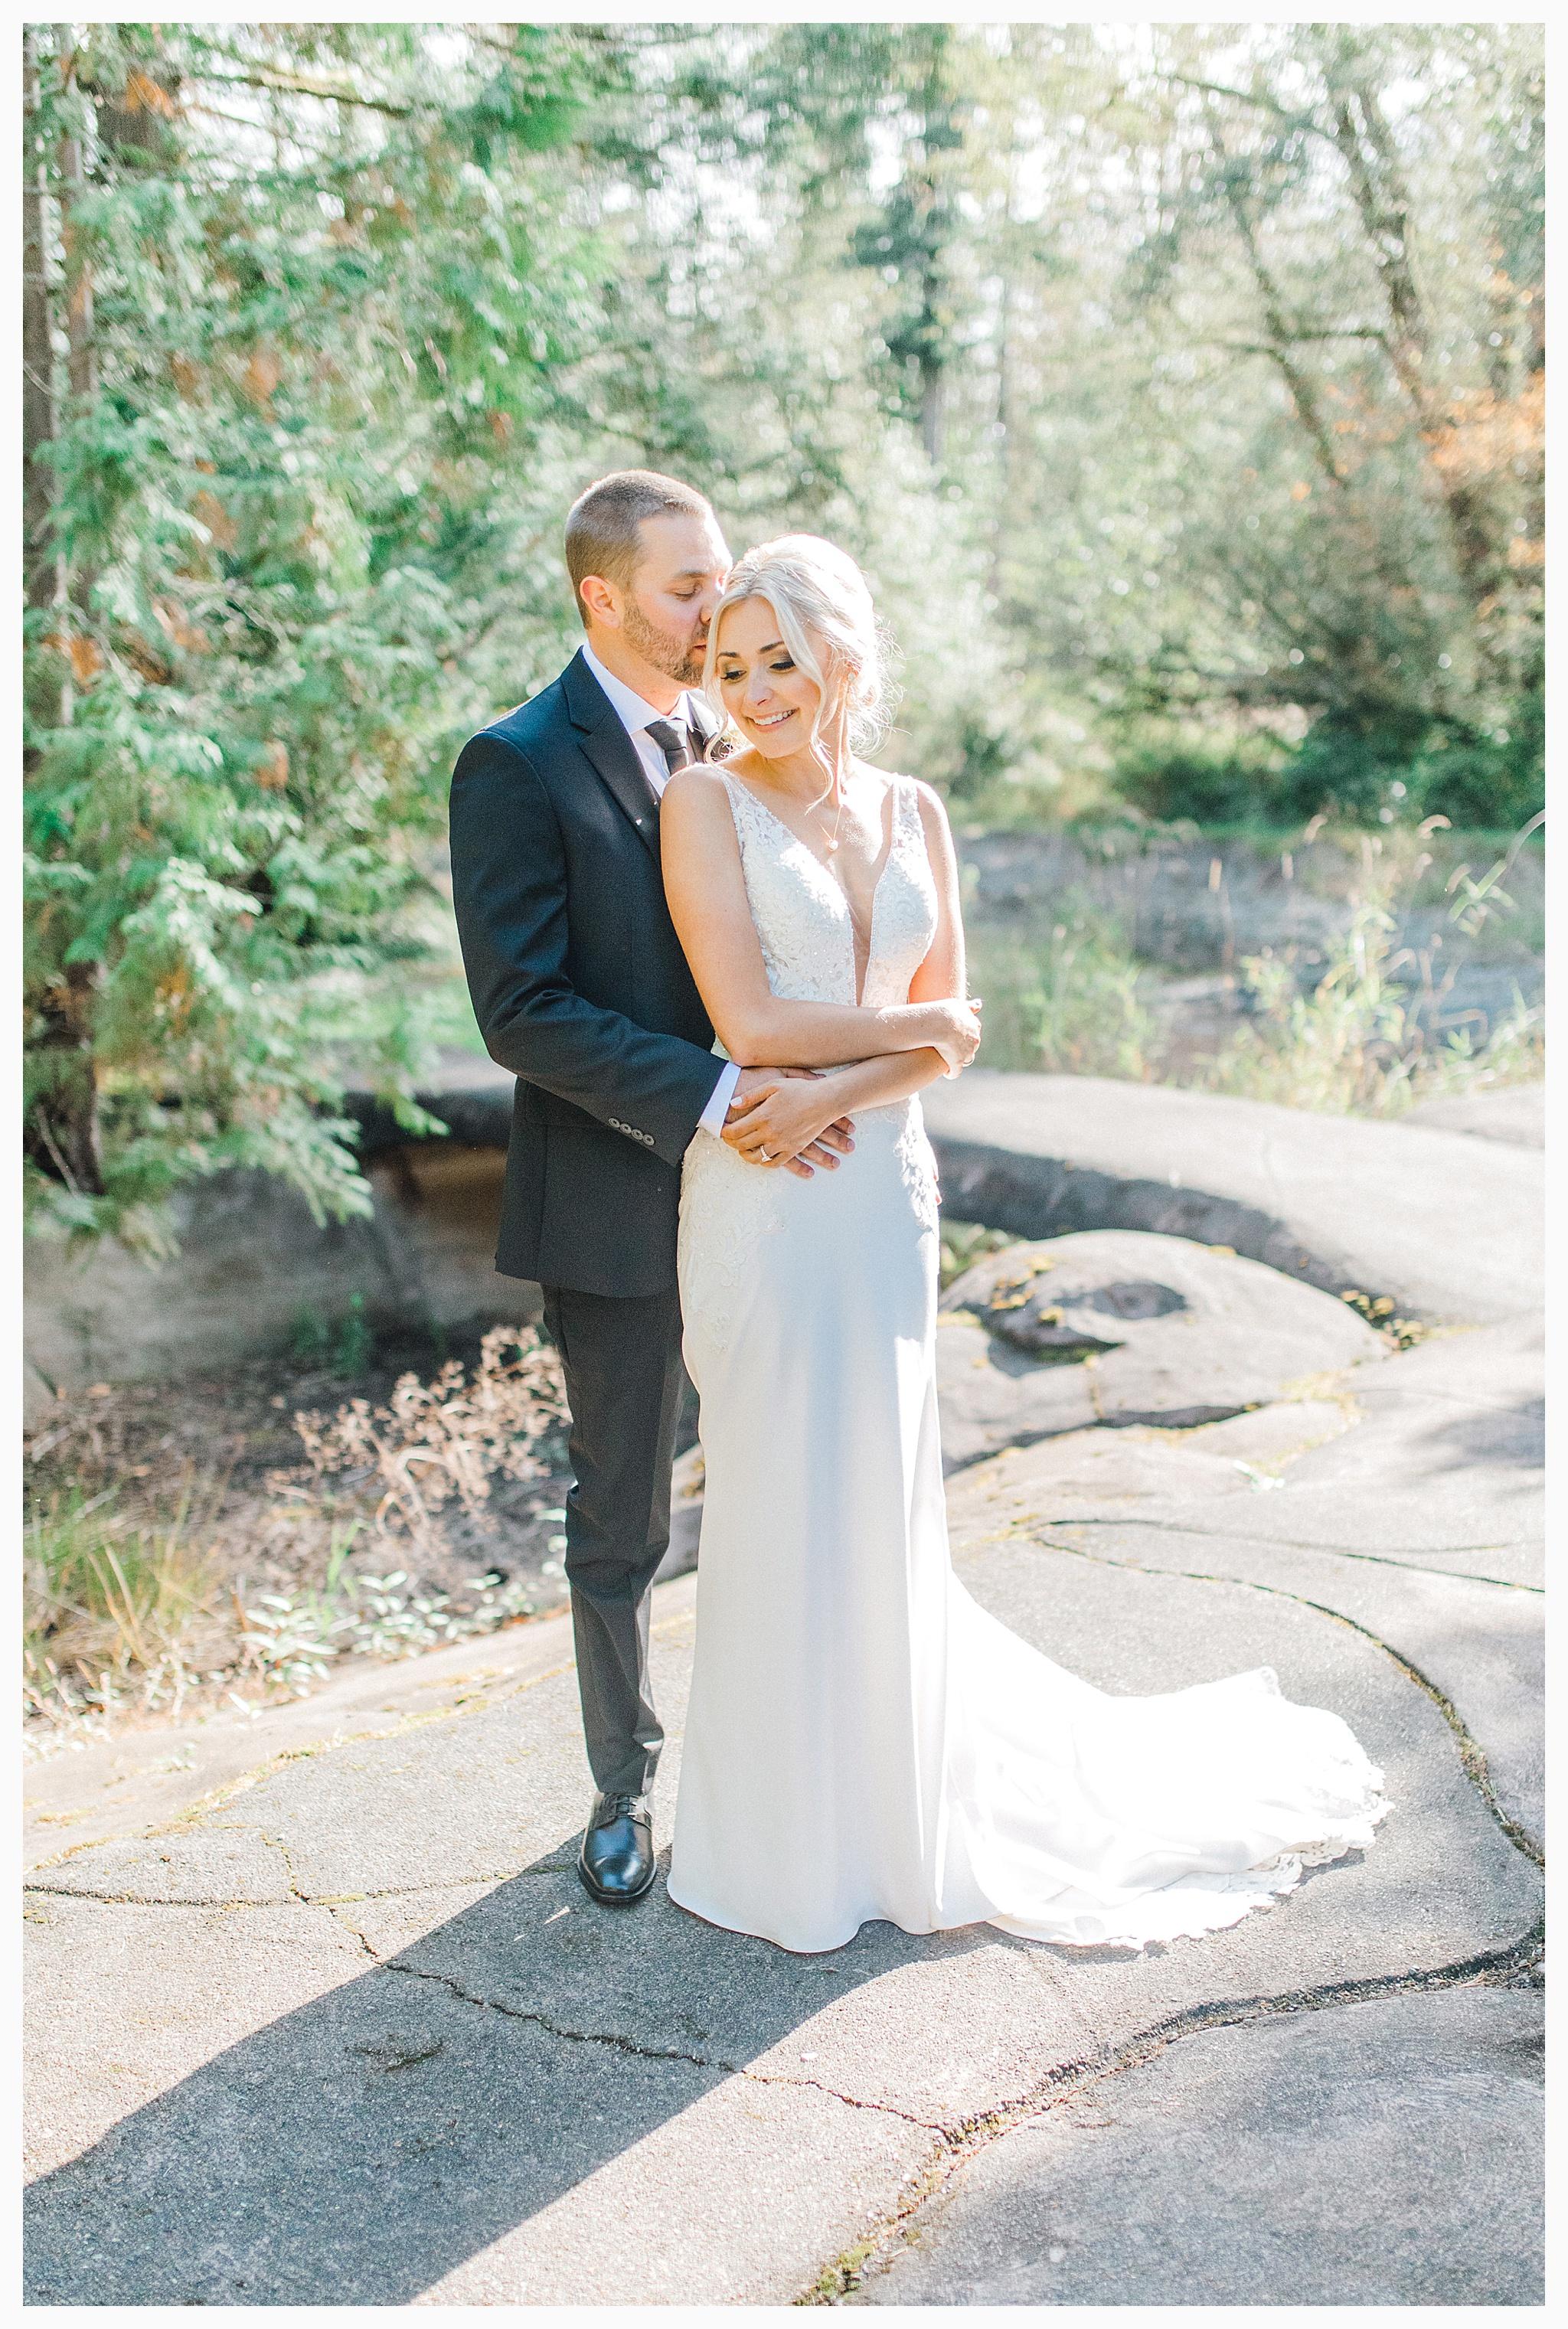 Emma Rose Company Light and Airy Wedding Photographer, Beautiful fall wedding at Rock Creek Gardens Venue in Puyallup, Washington._0039.jpg